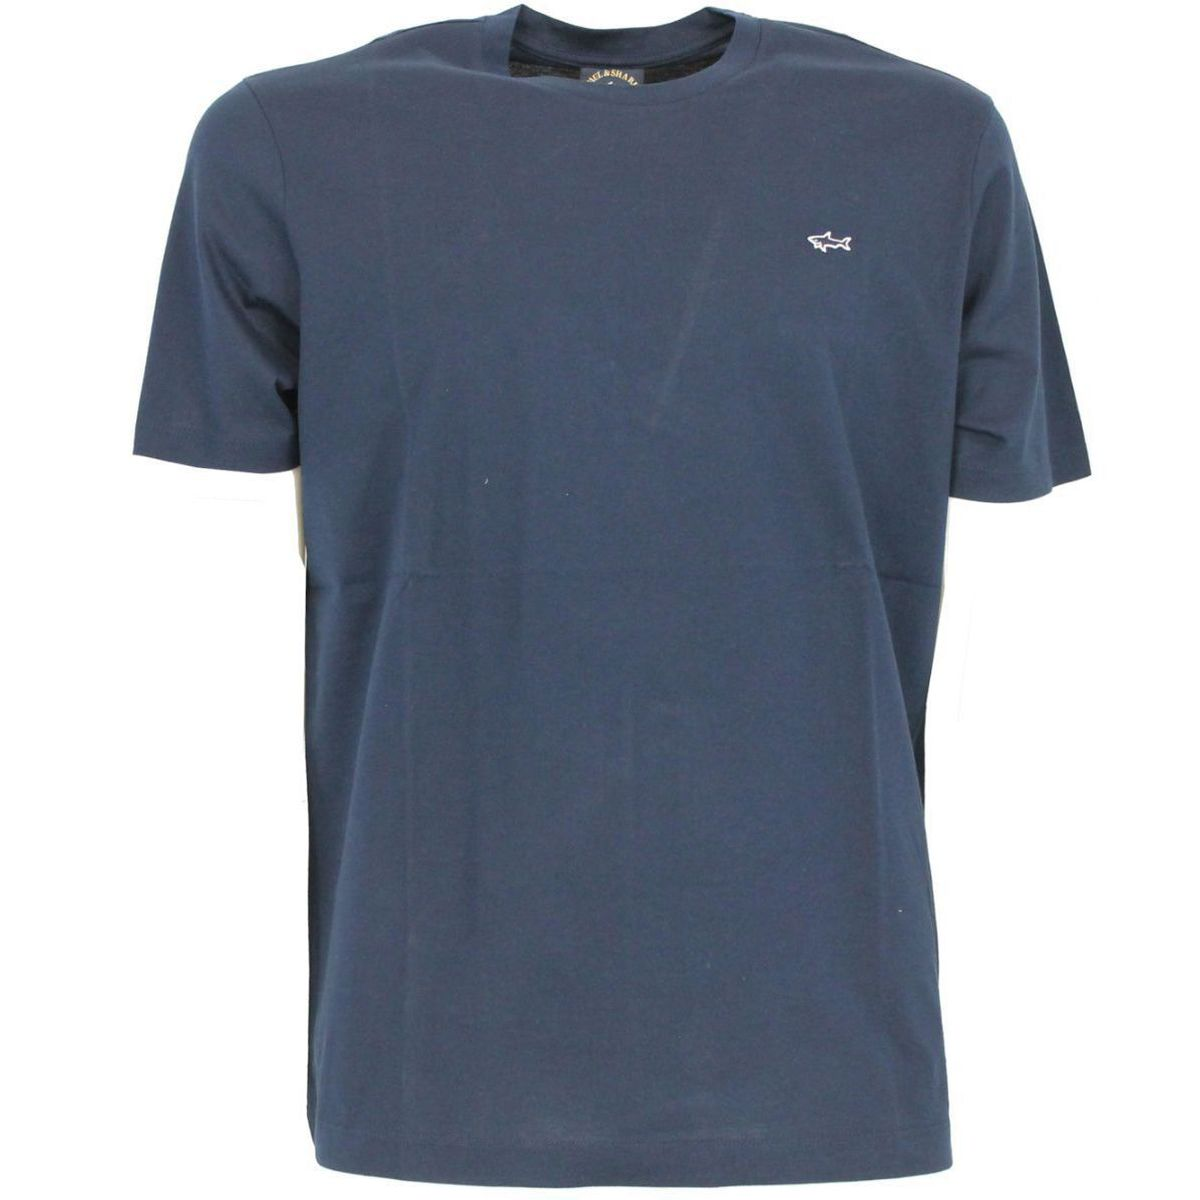 T-shirt in cotone con logo ricamato Blue PAUL & SHARK